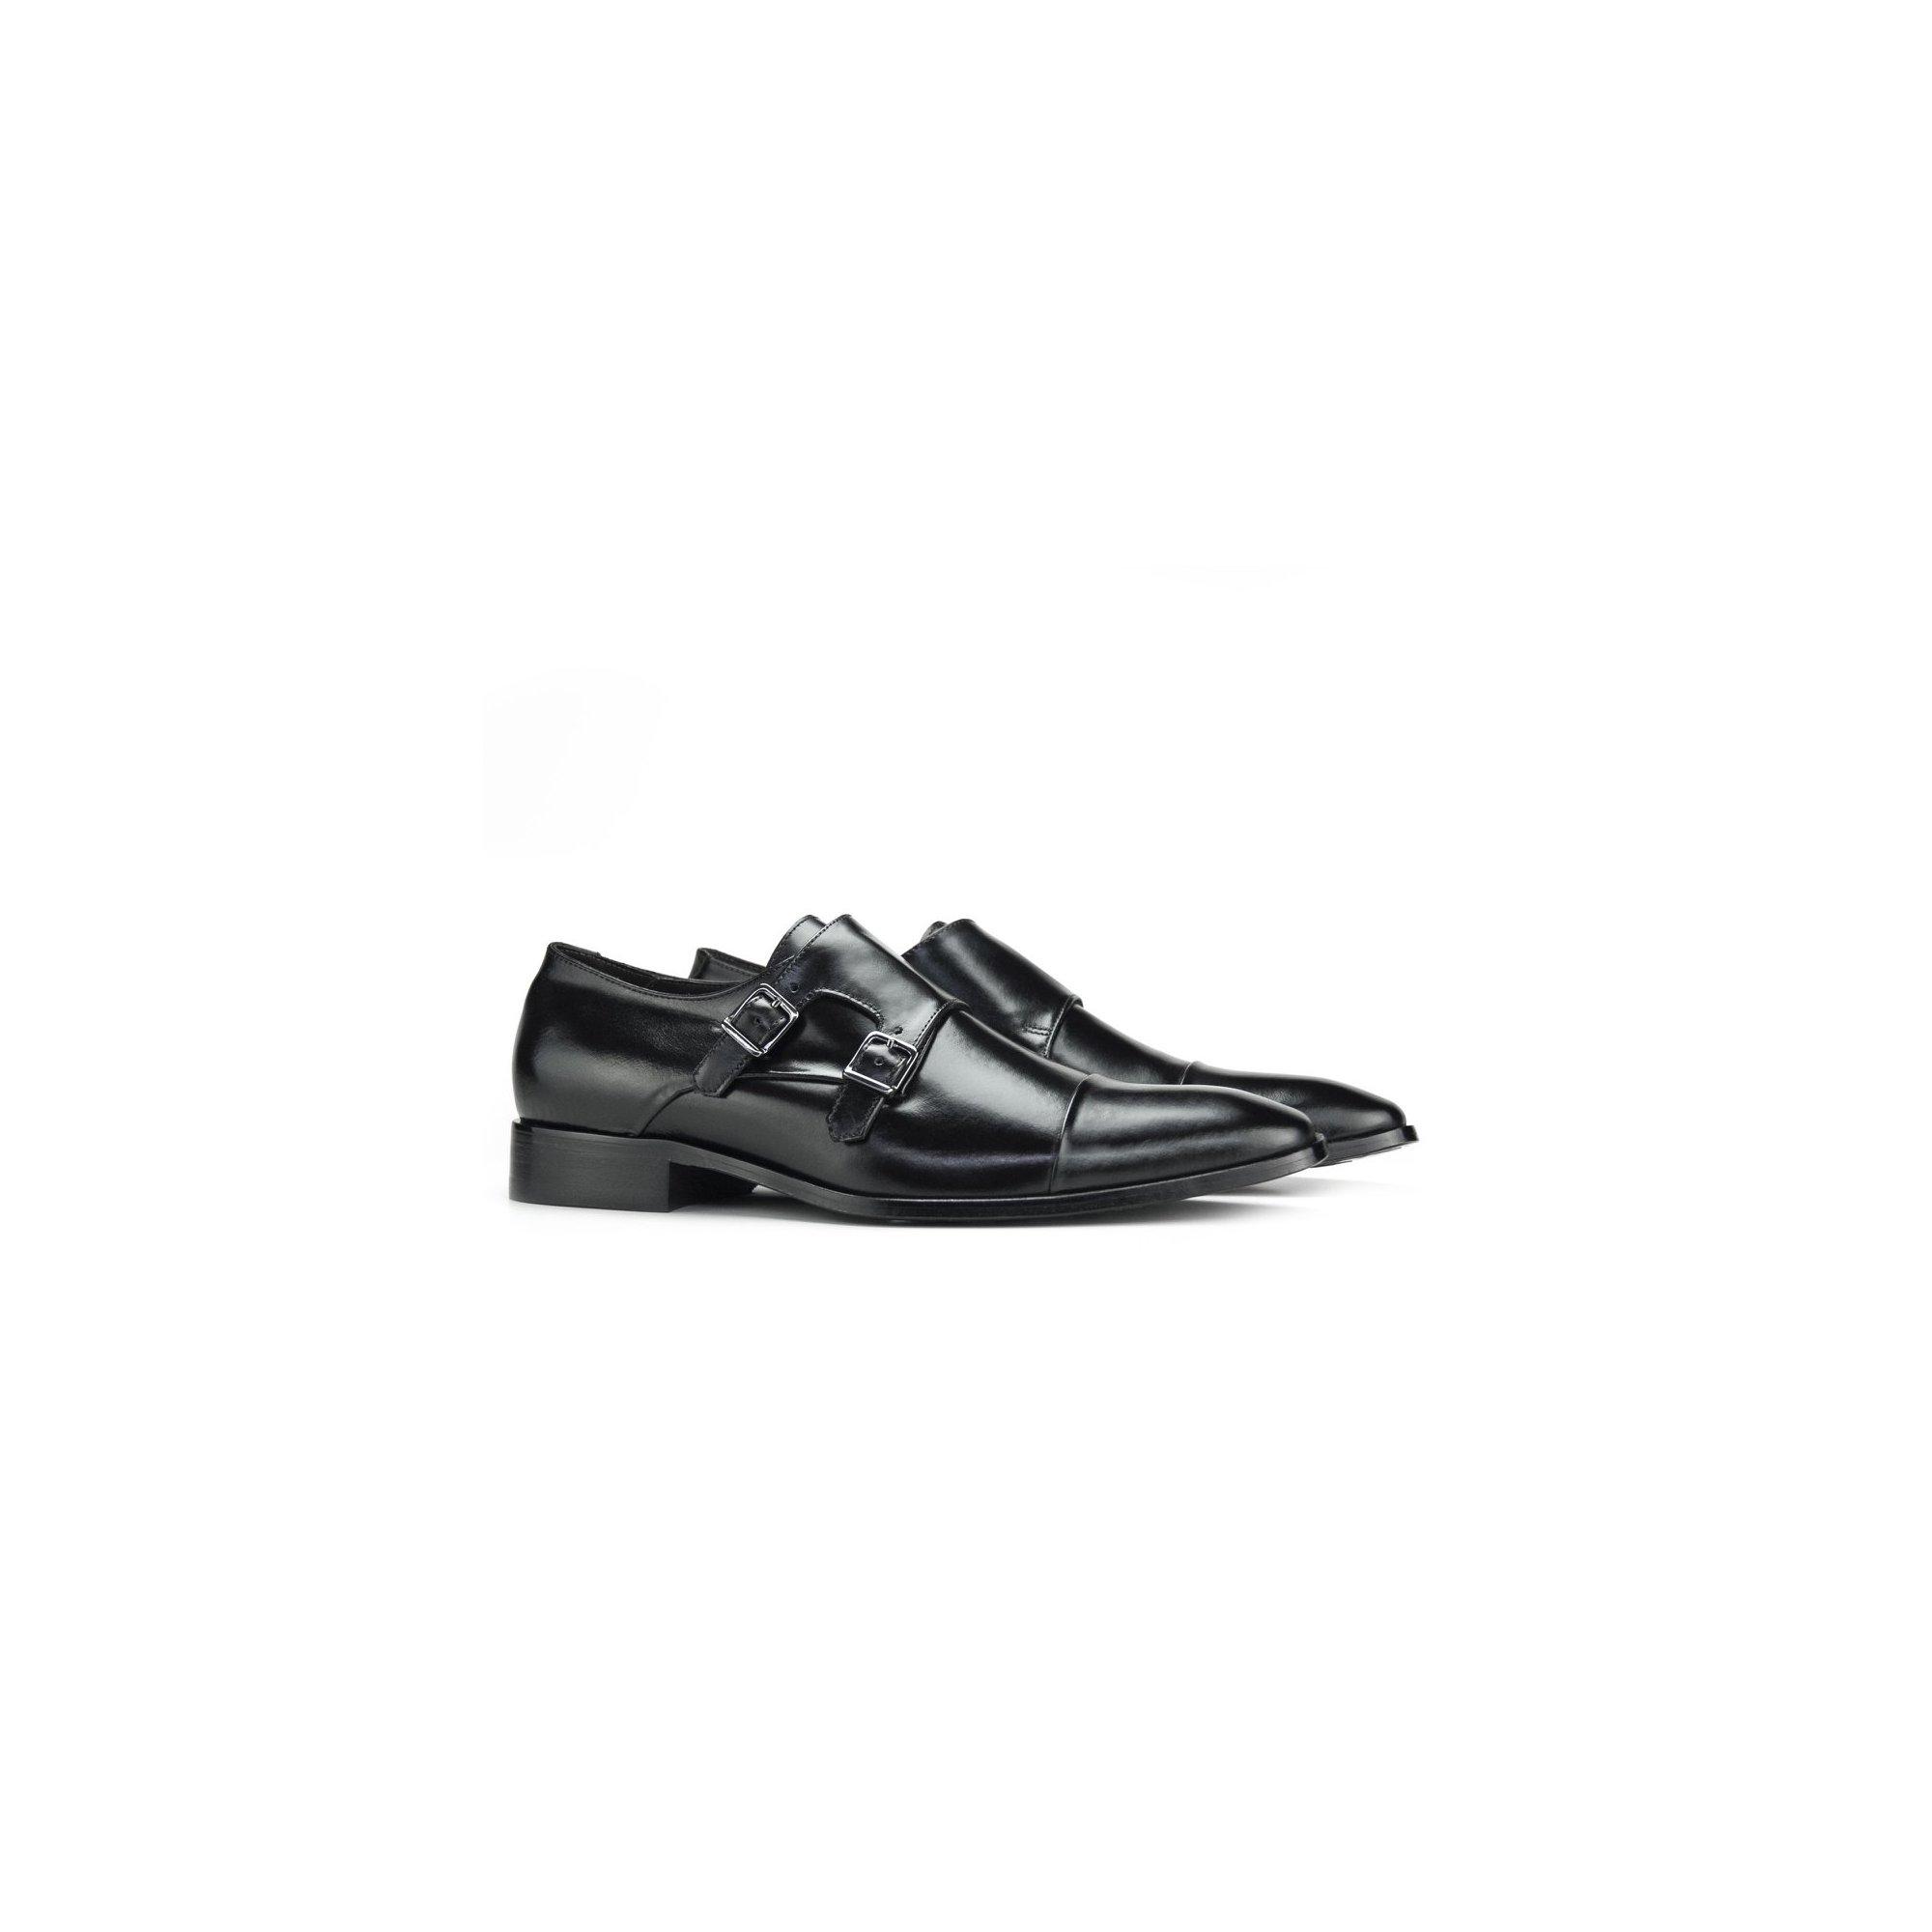 Sapato Social Masculino Monk Strap Preto Couro Legítimo Monbran Dressy 0319039P